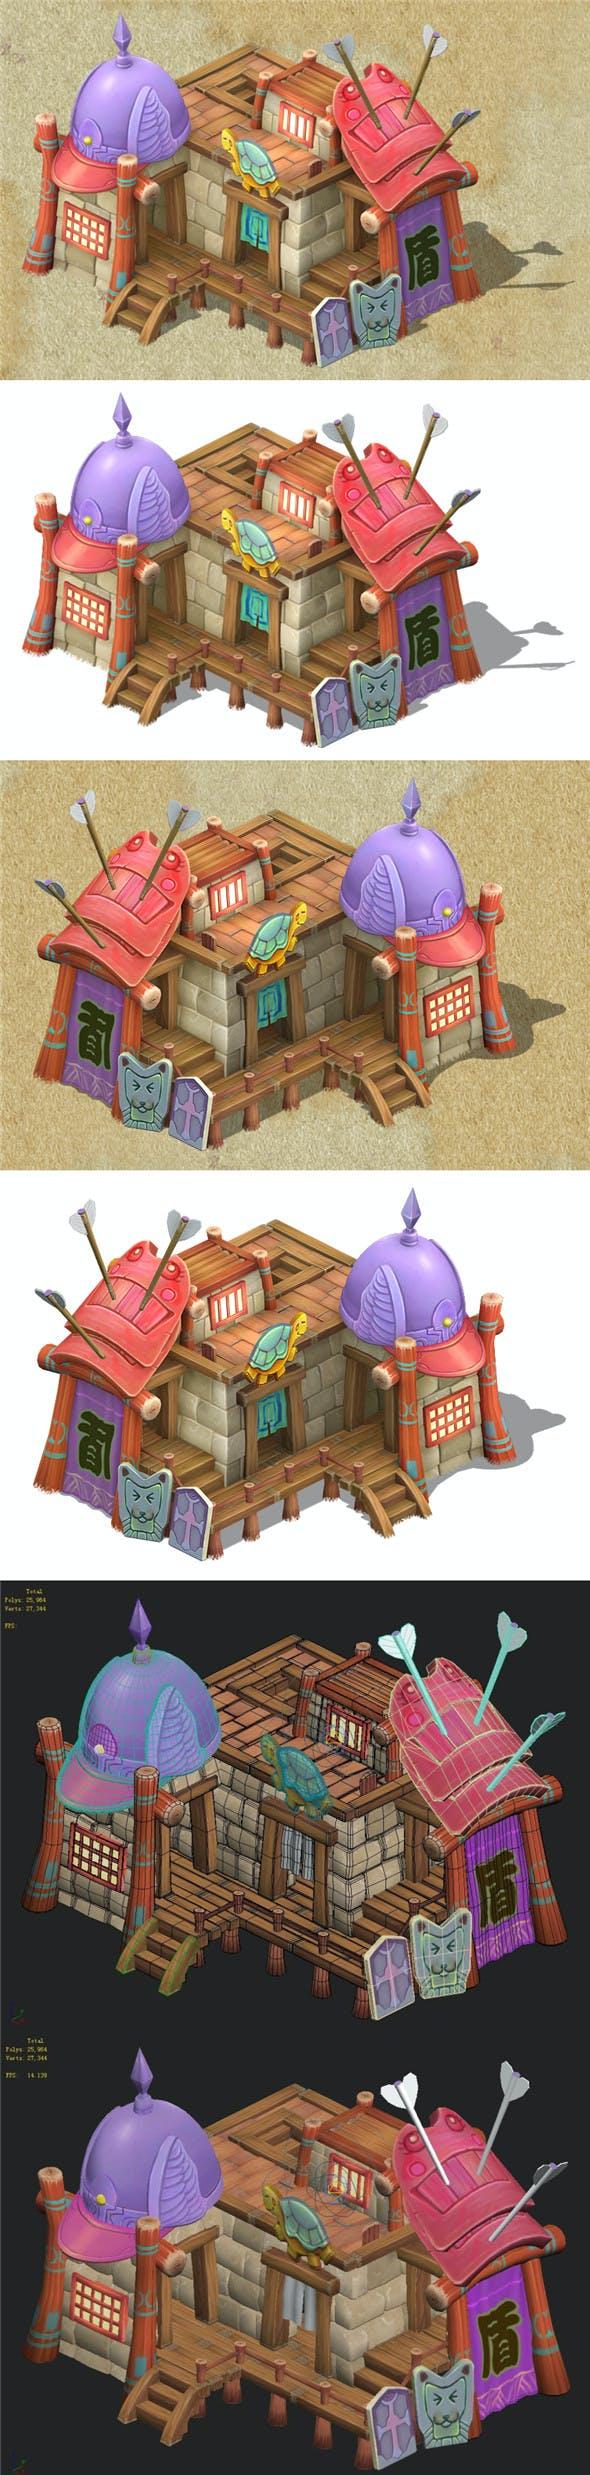 Cartoon Edition - Armor Shop 03 - 3DOcean Item for Sale